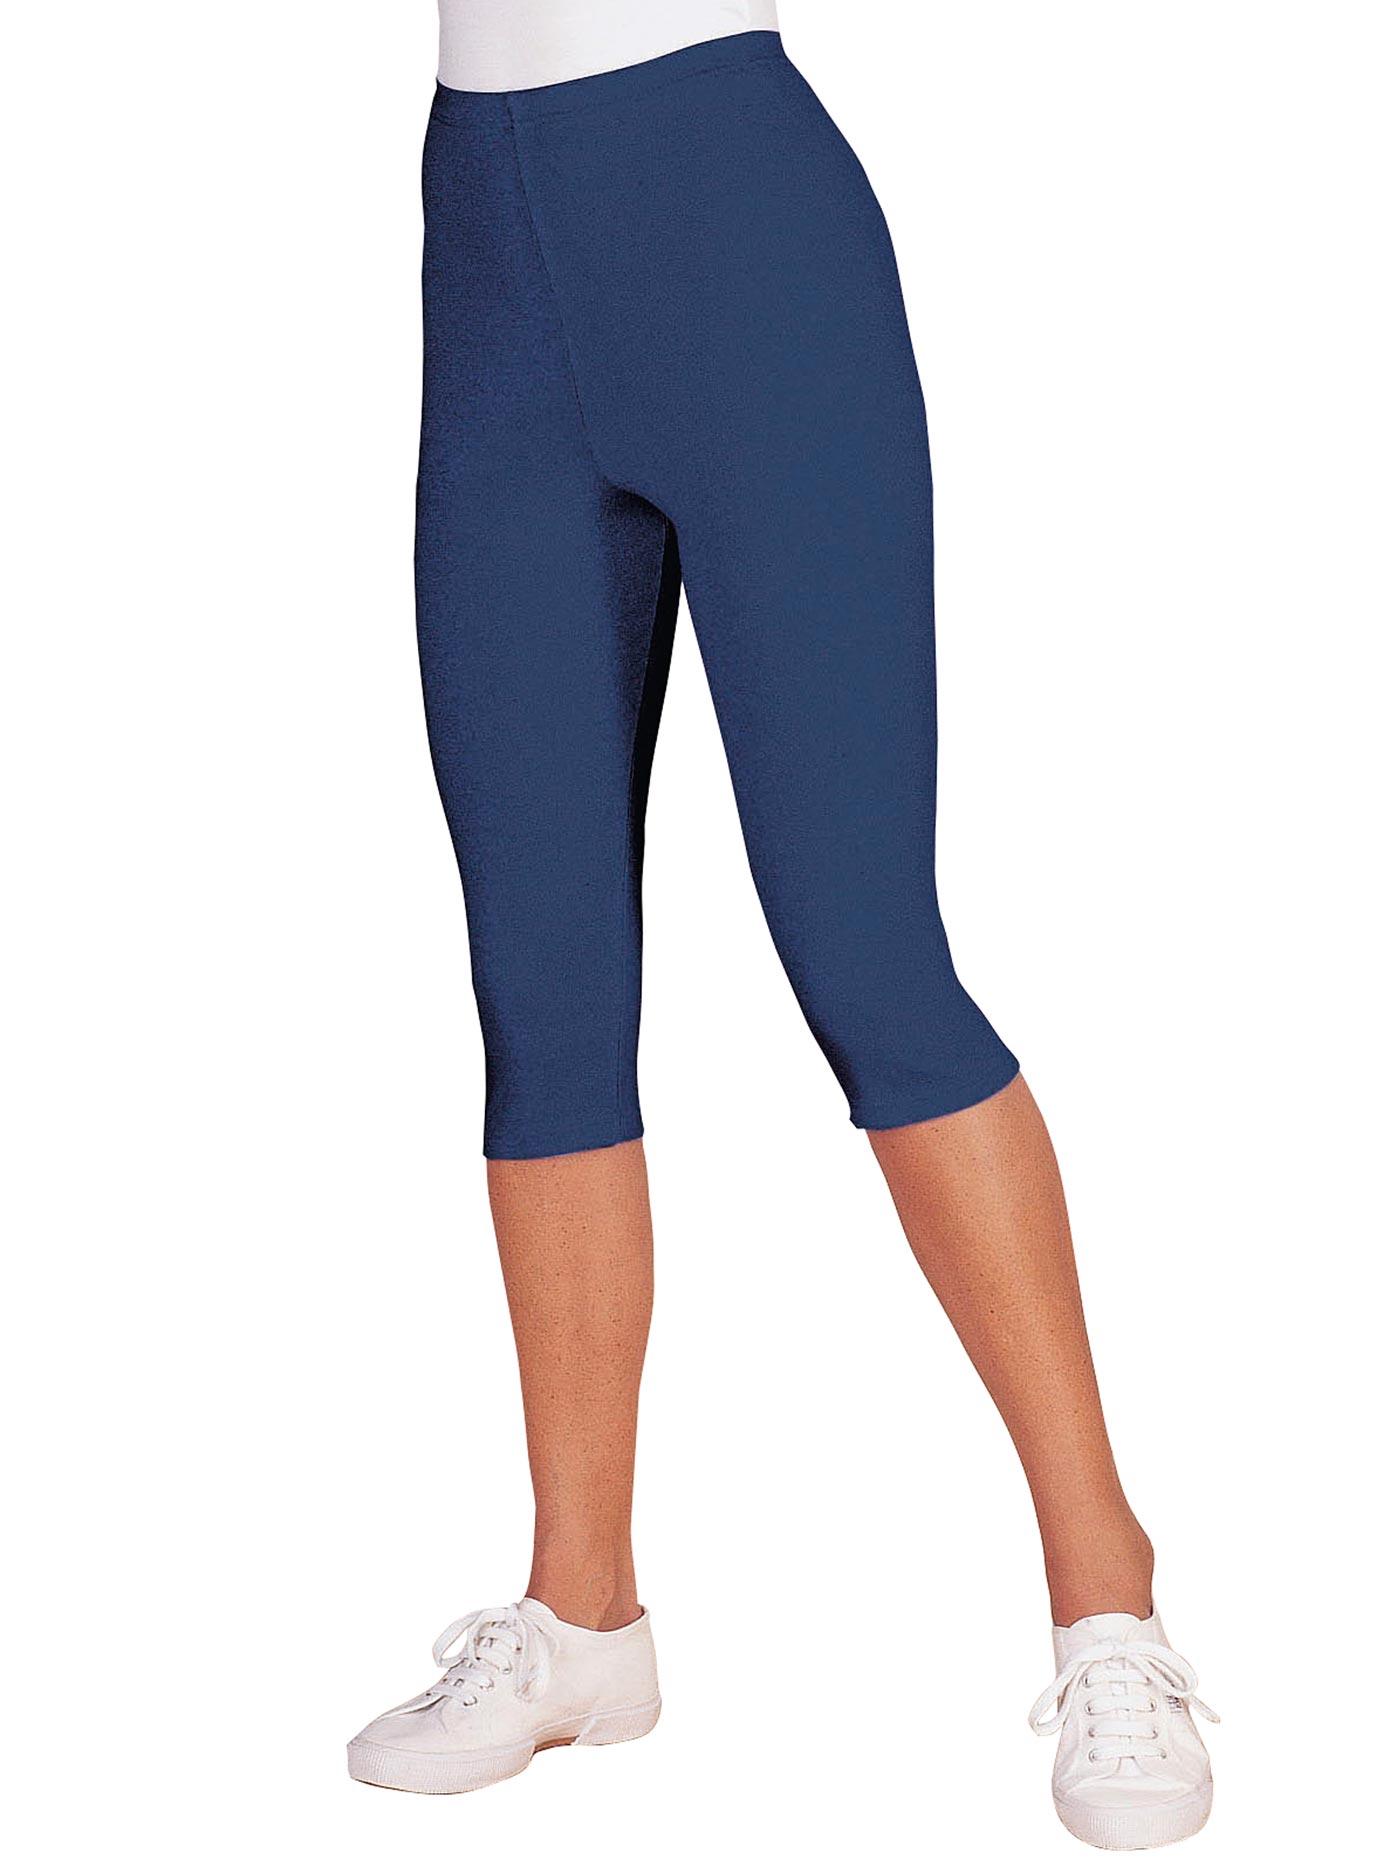 classic basics capri leggings mit gummizug auf rechnung baur. Black Bedroom Furniture Sets. Home Design Ideas